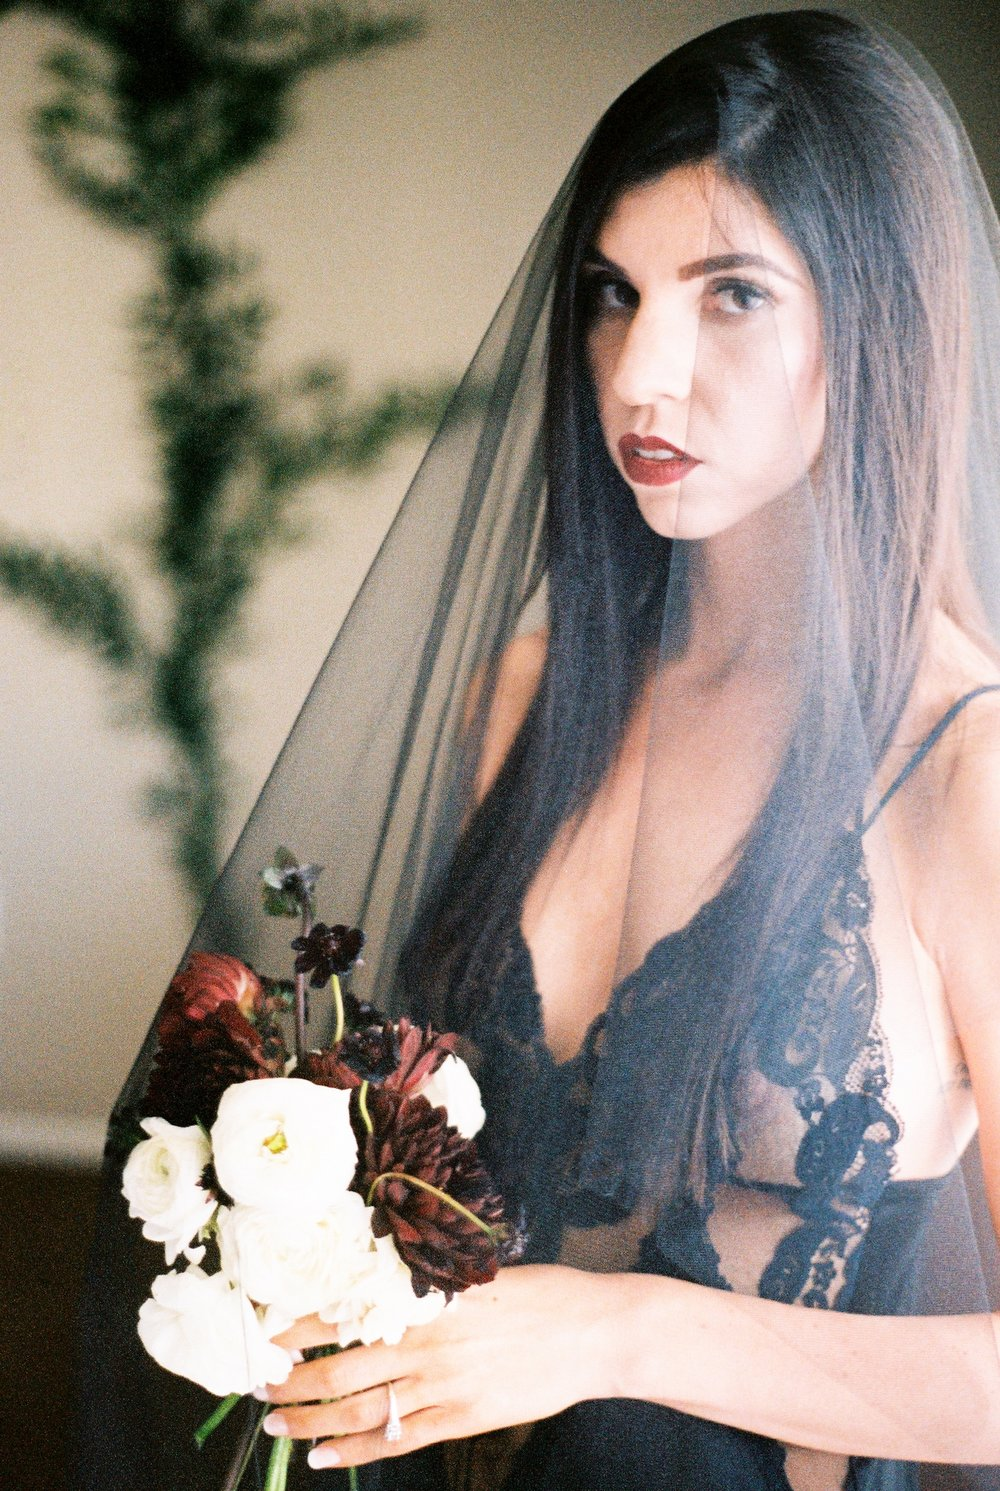 Boudoir-Collective-Fine-Art-Boudoir-Blog-Peaches-Twine-Photography-Halloween-Witch-Boudoir-22.jpg